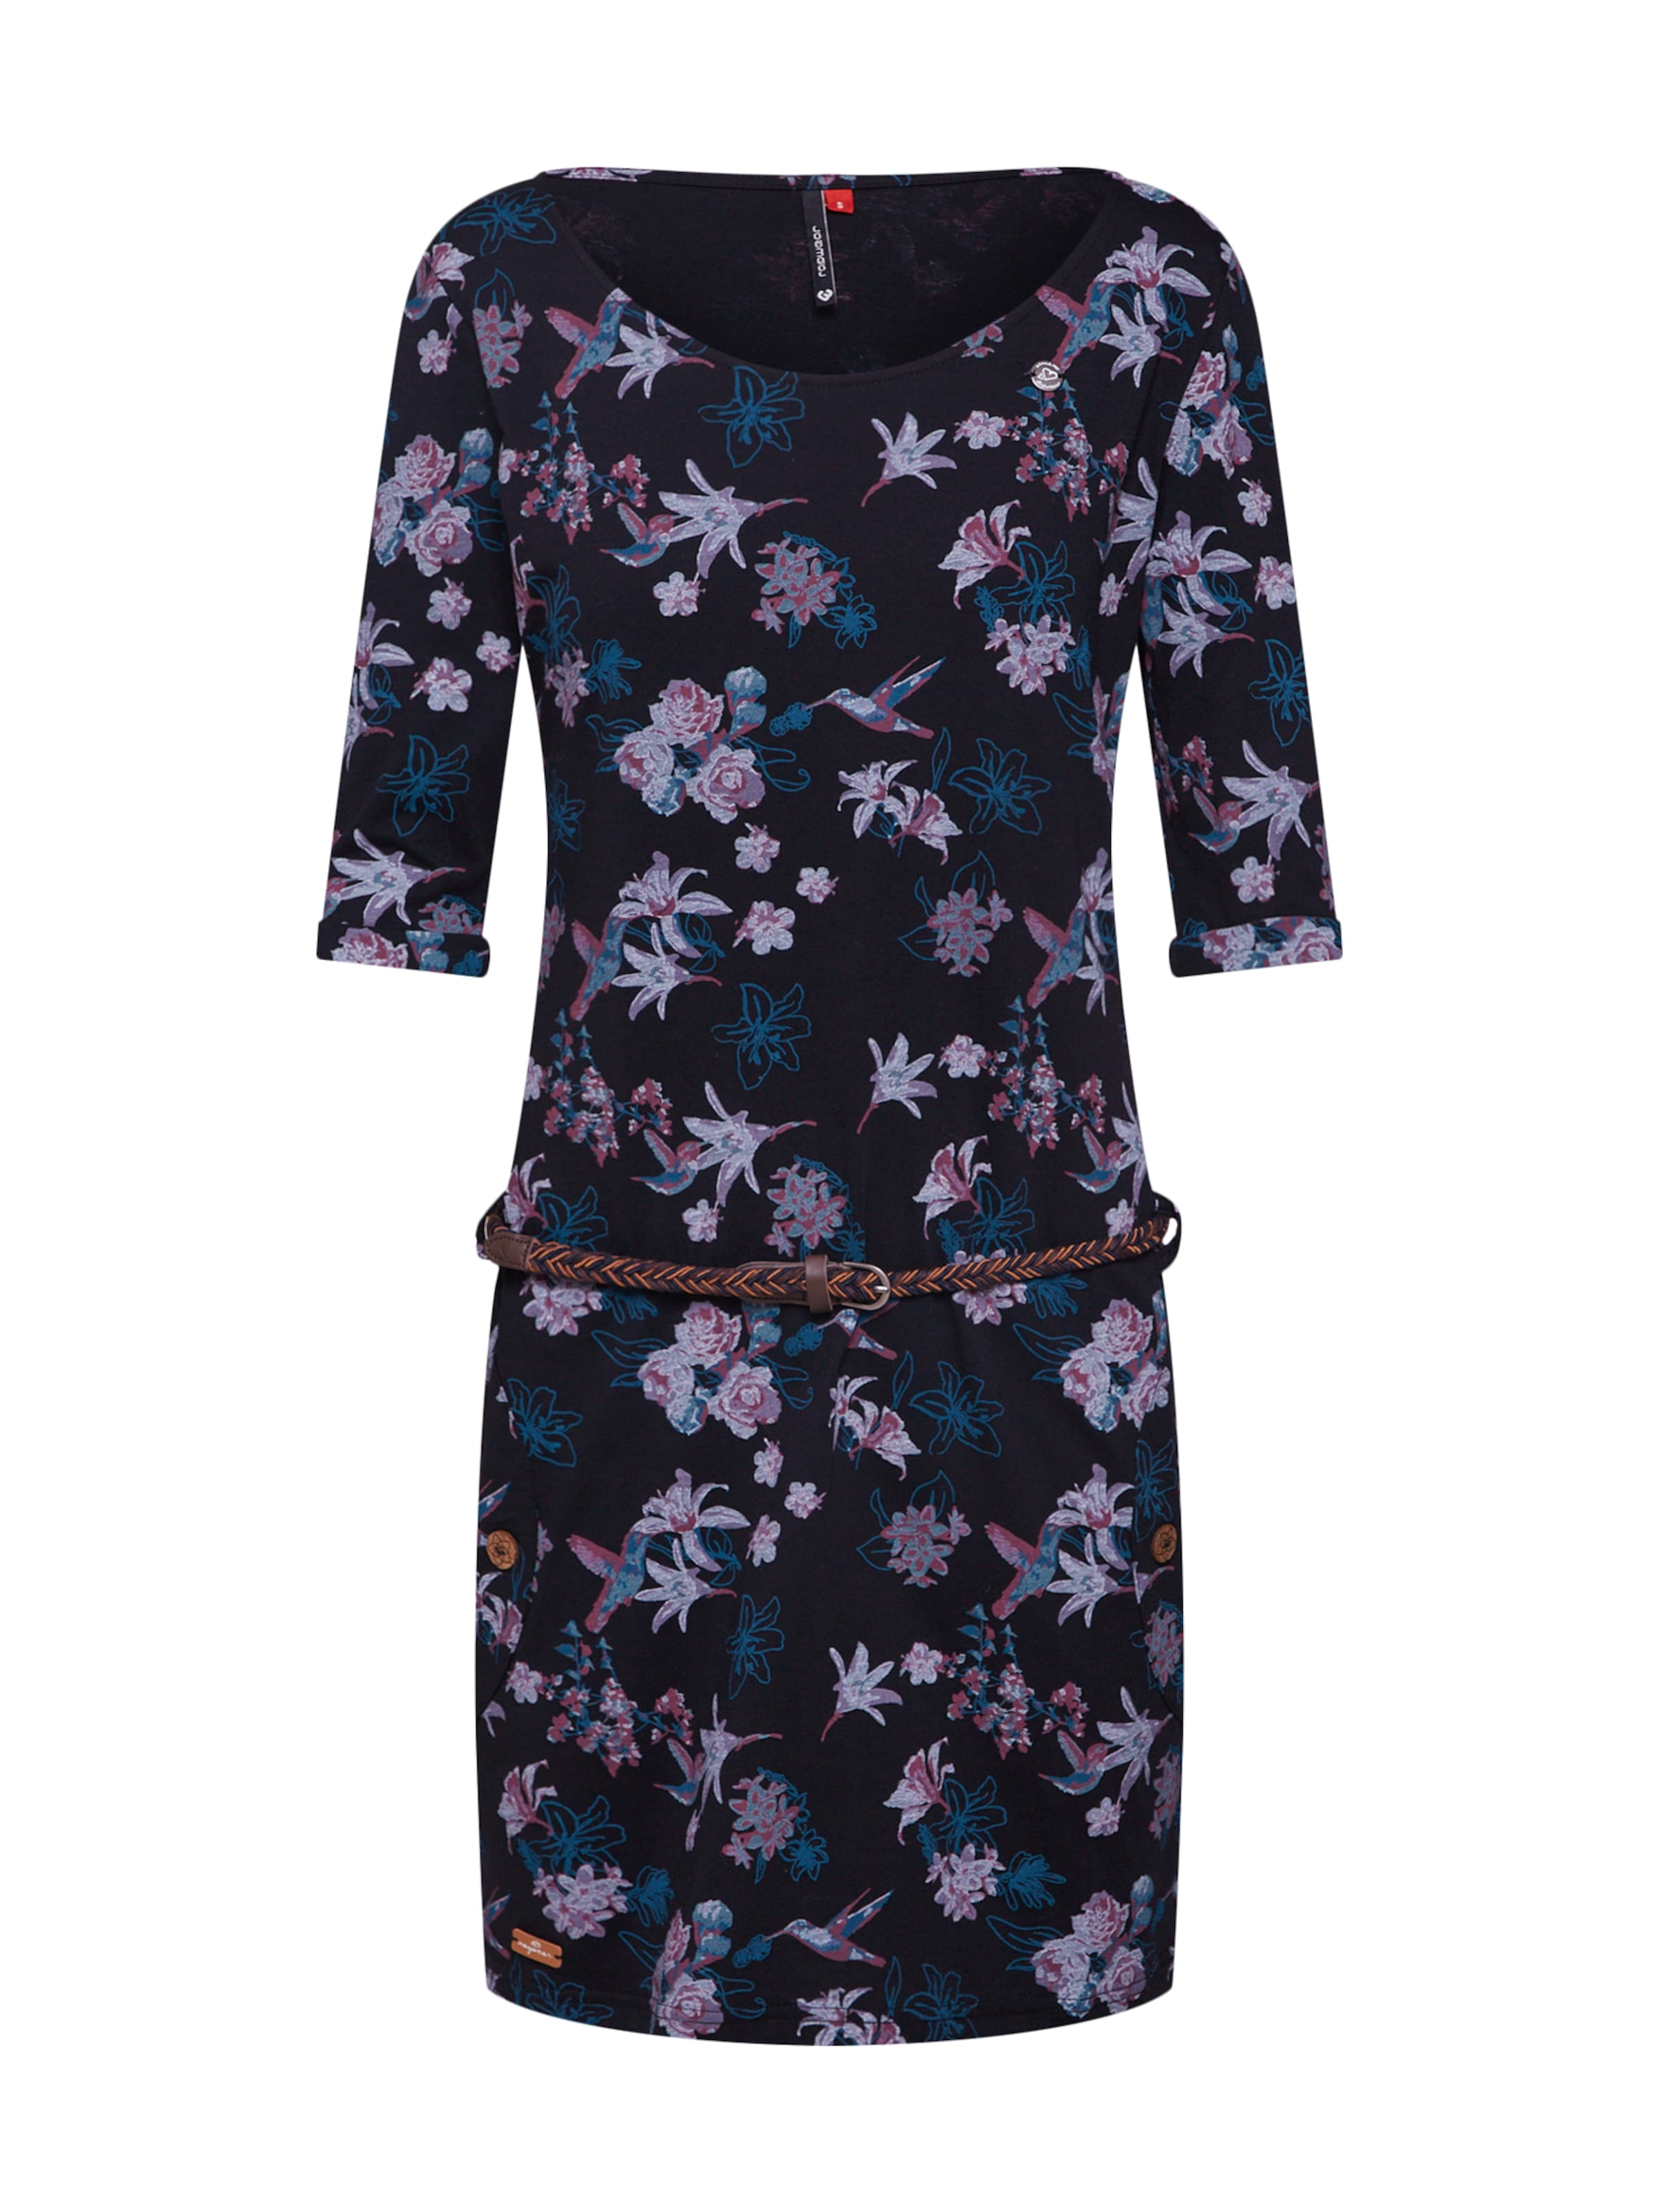 Kleid In Flowers' Schwarz Ragwear BlauDunkellila 'tanya SzUMpV